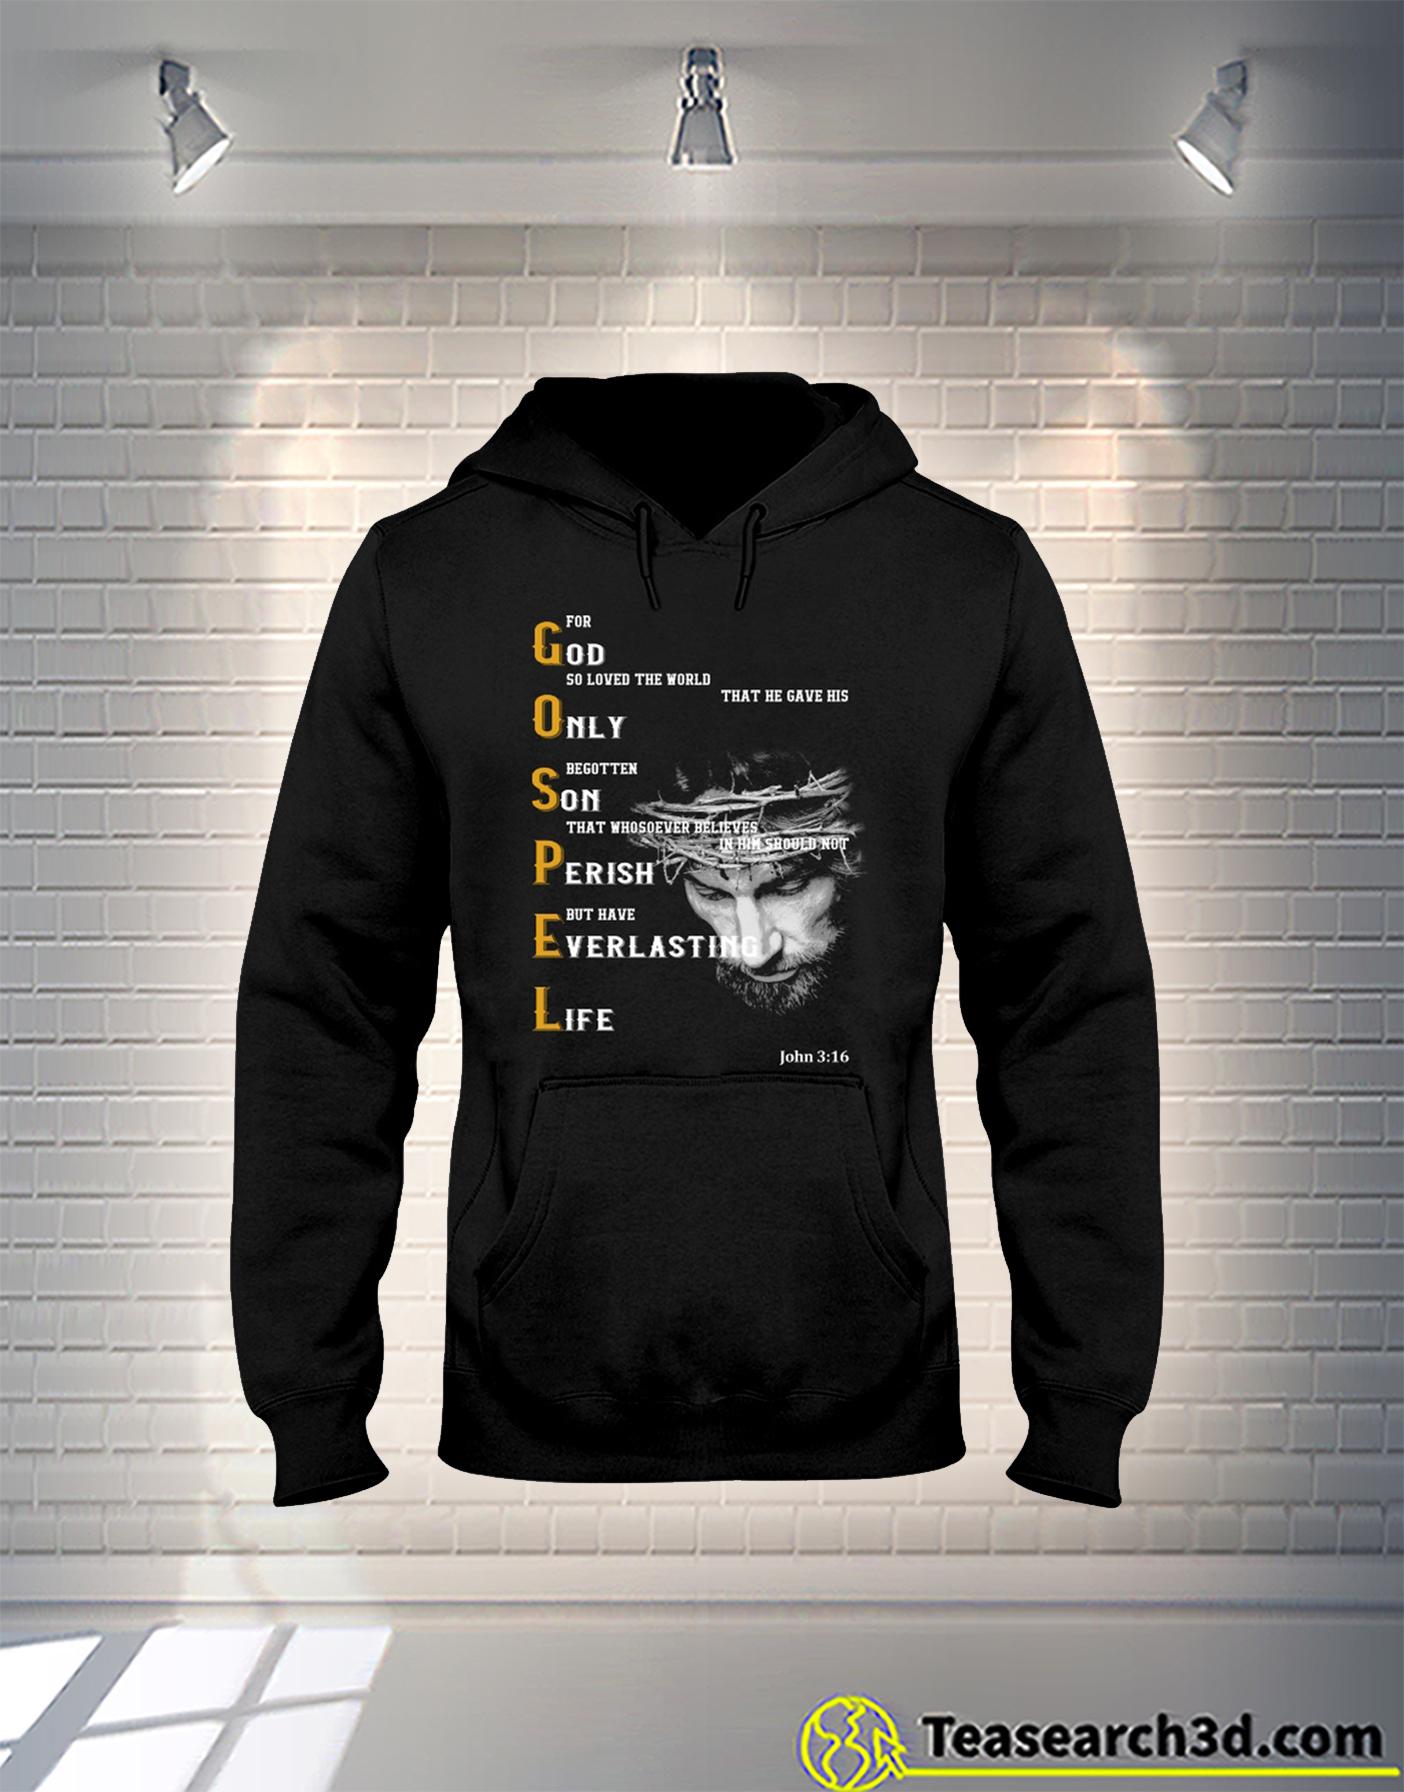 God only son perish everlasting life hoodie